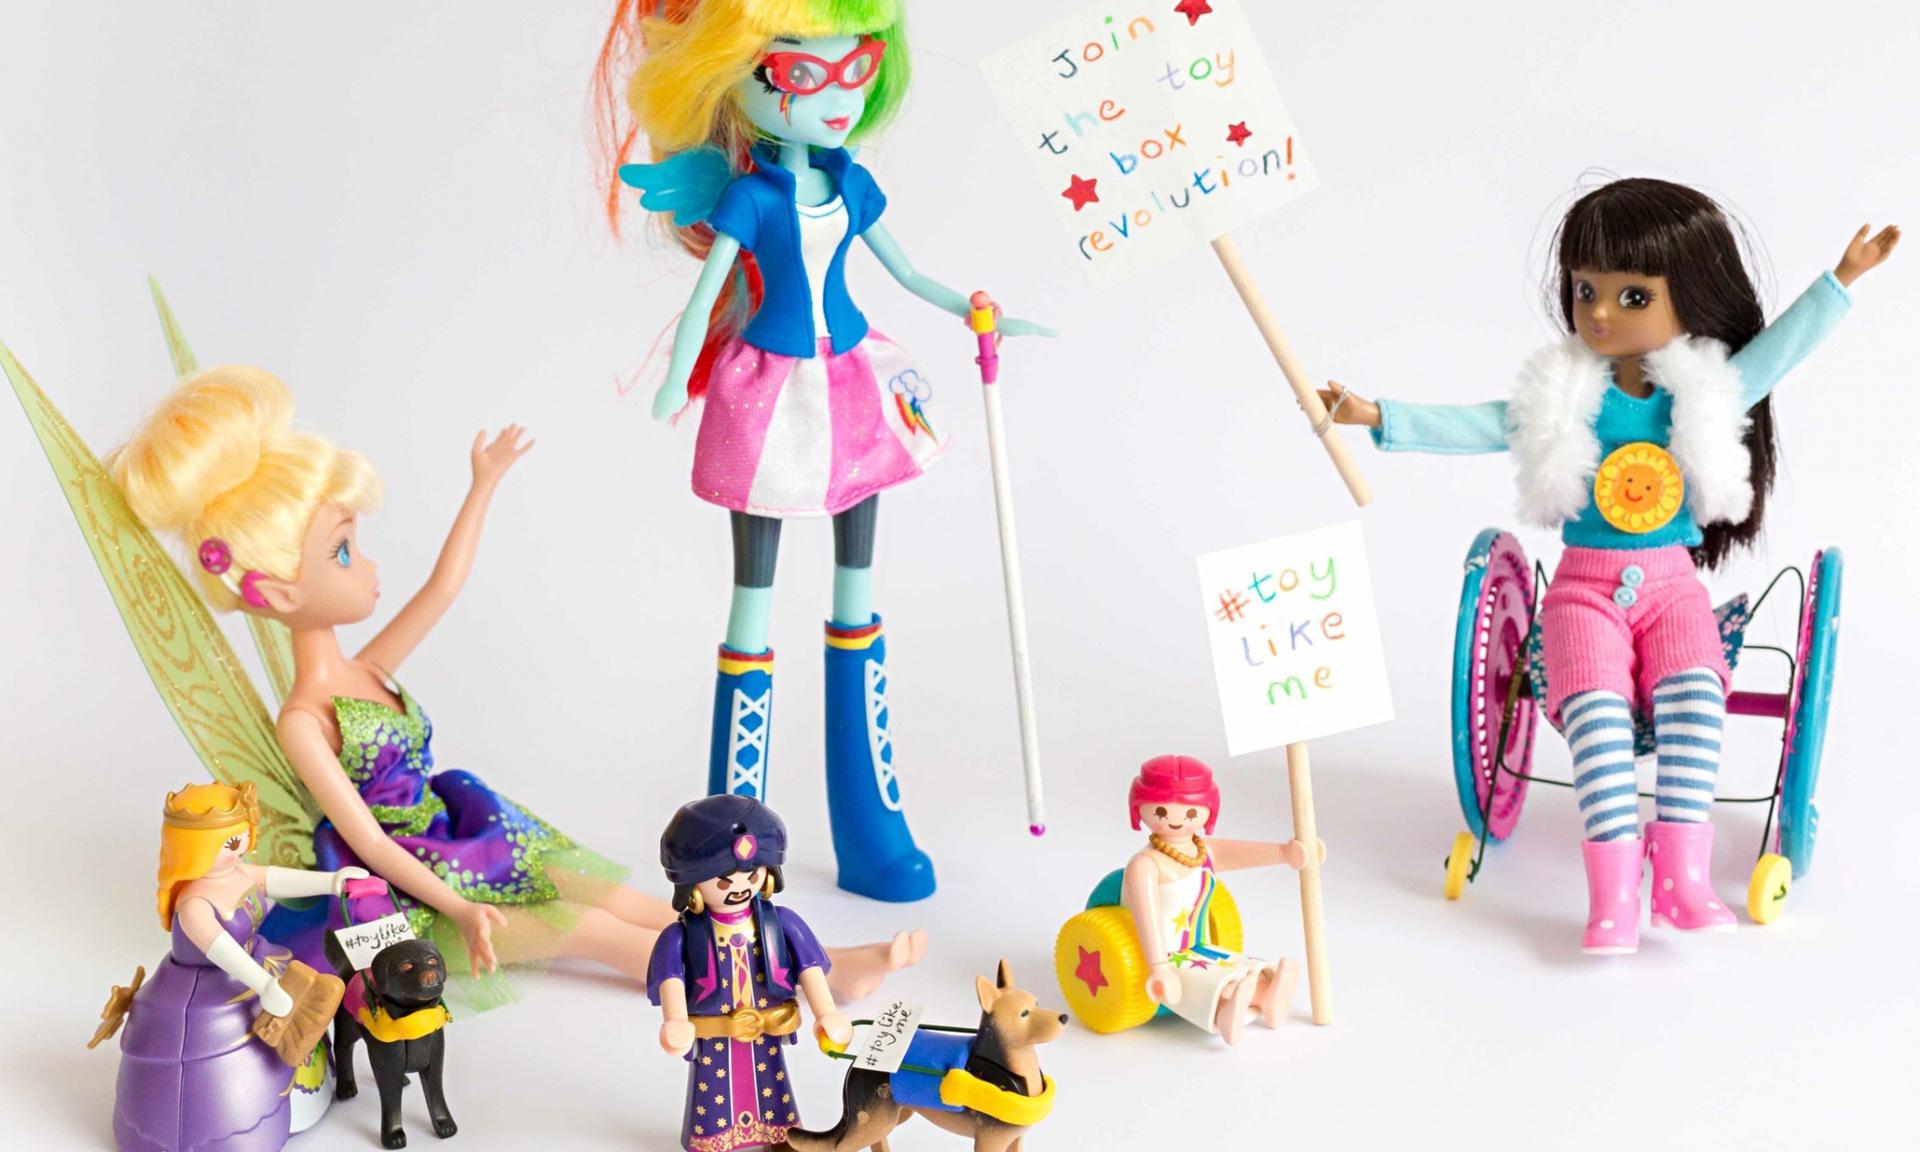 Toy-Like-Me-1